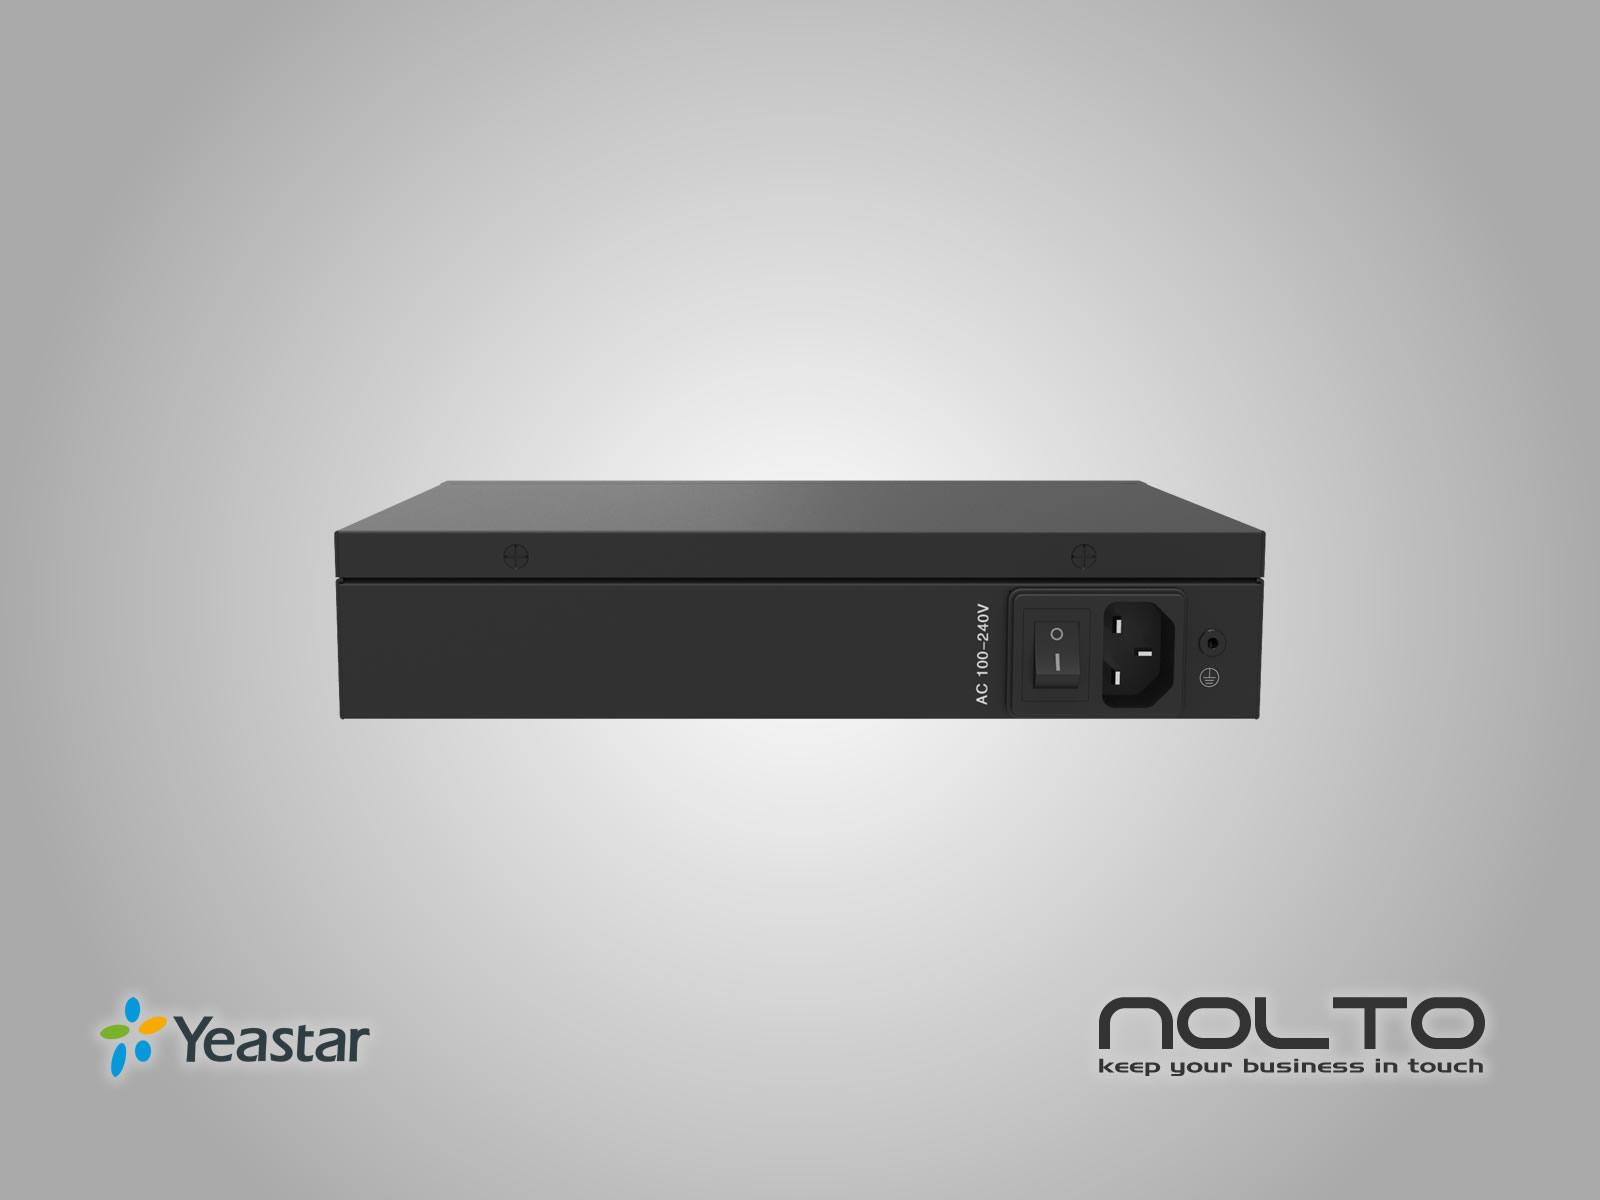 Yeastar TE100 E1/T1 1 Port PRI VoIP SIP Gateway